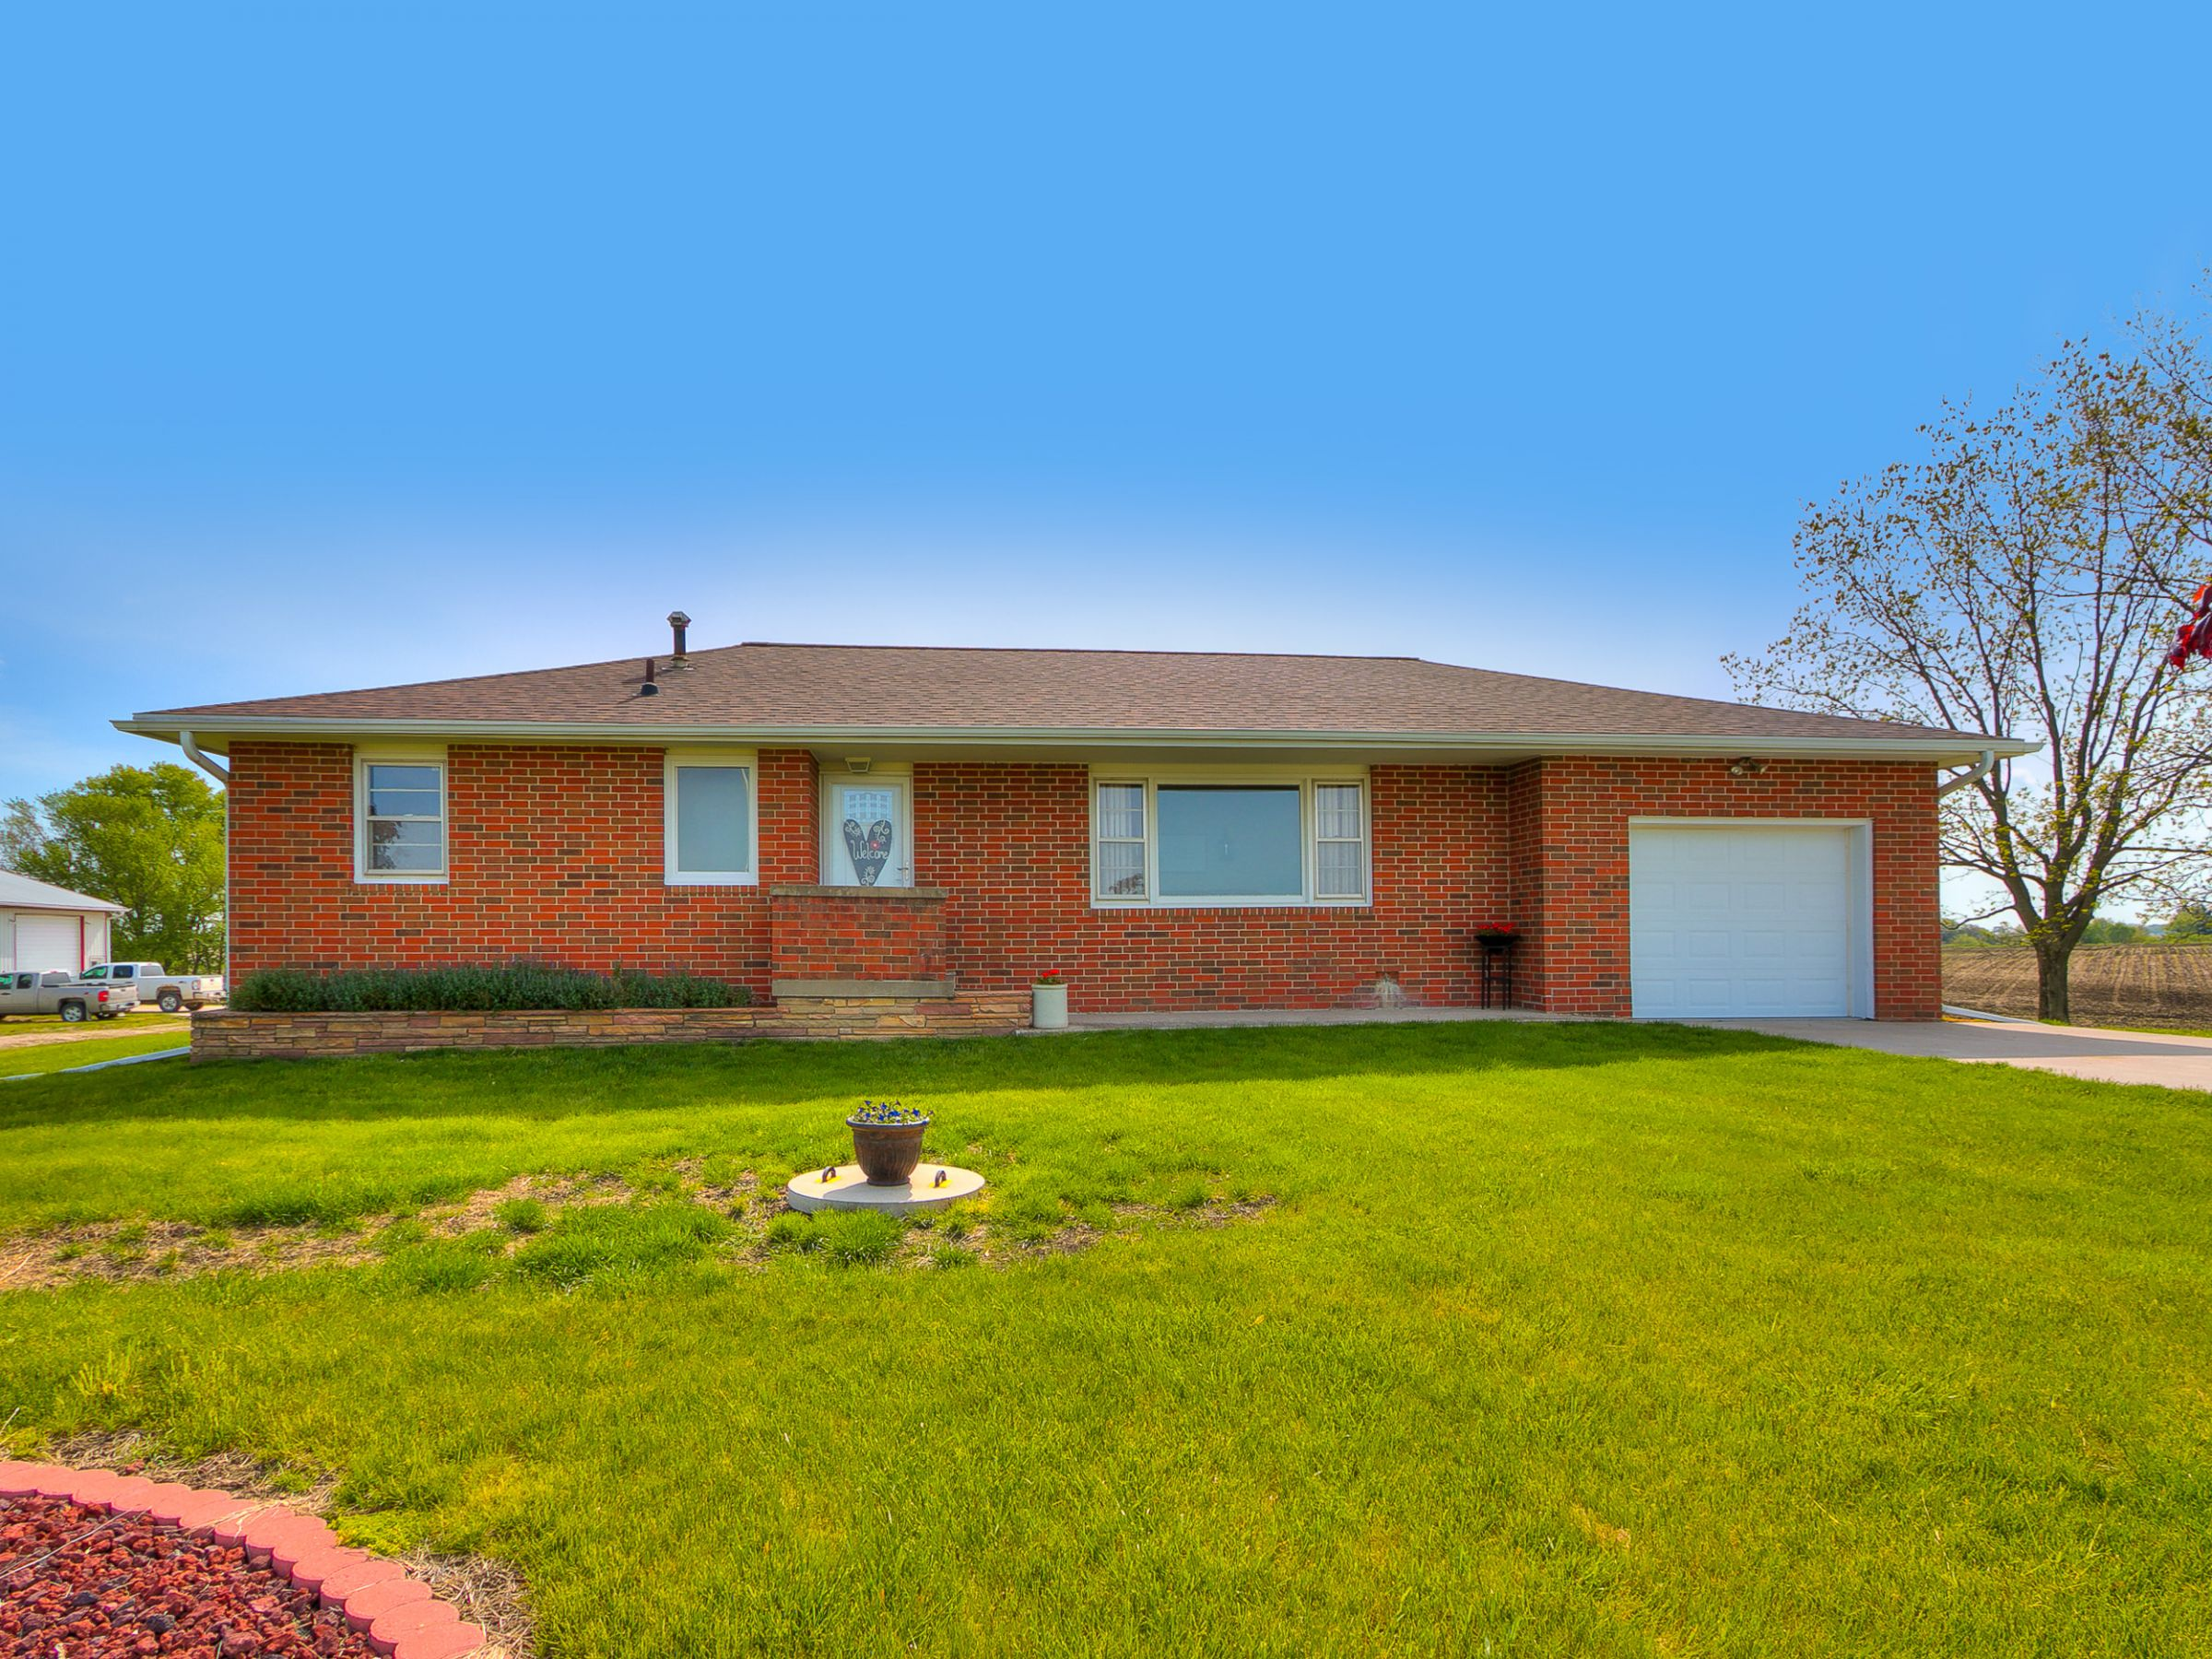 residential-warren-county-iowa-3-acres-listing-number-15516-1-2021-05-12-144632.jpg